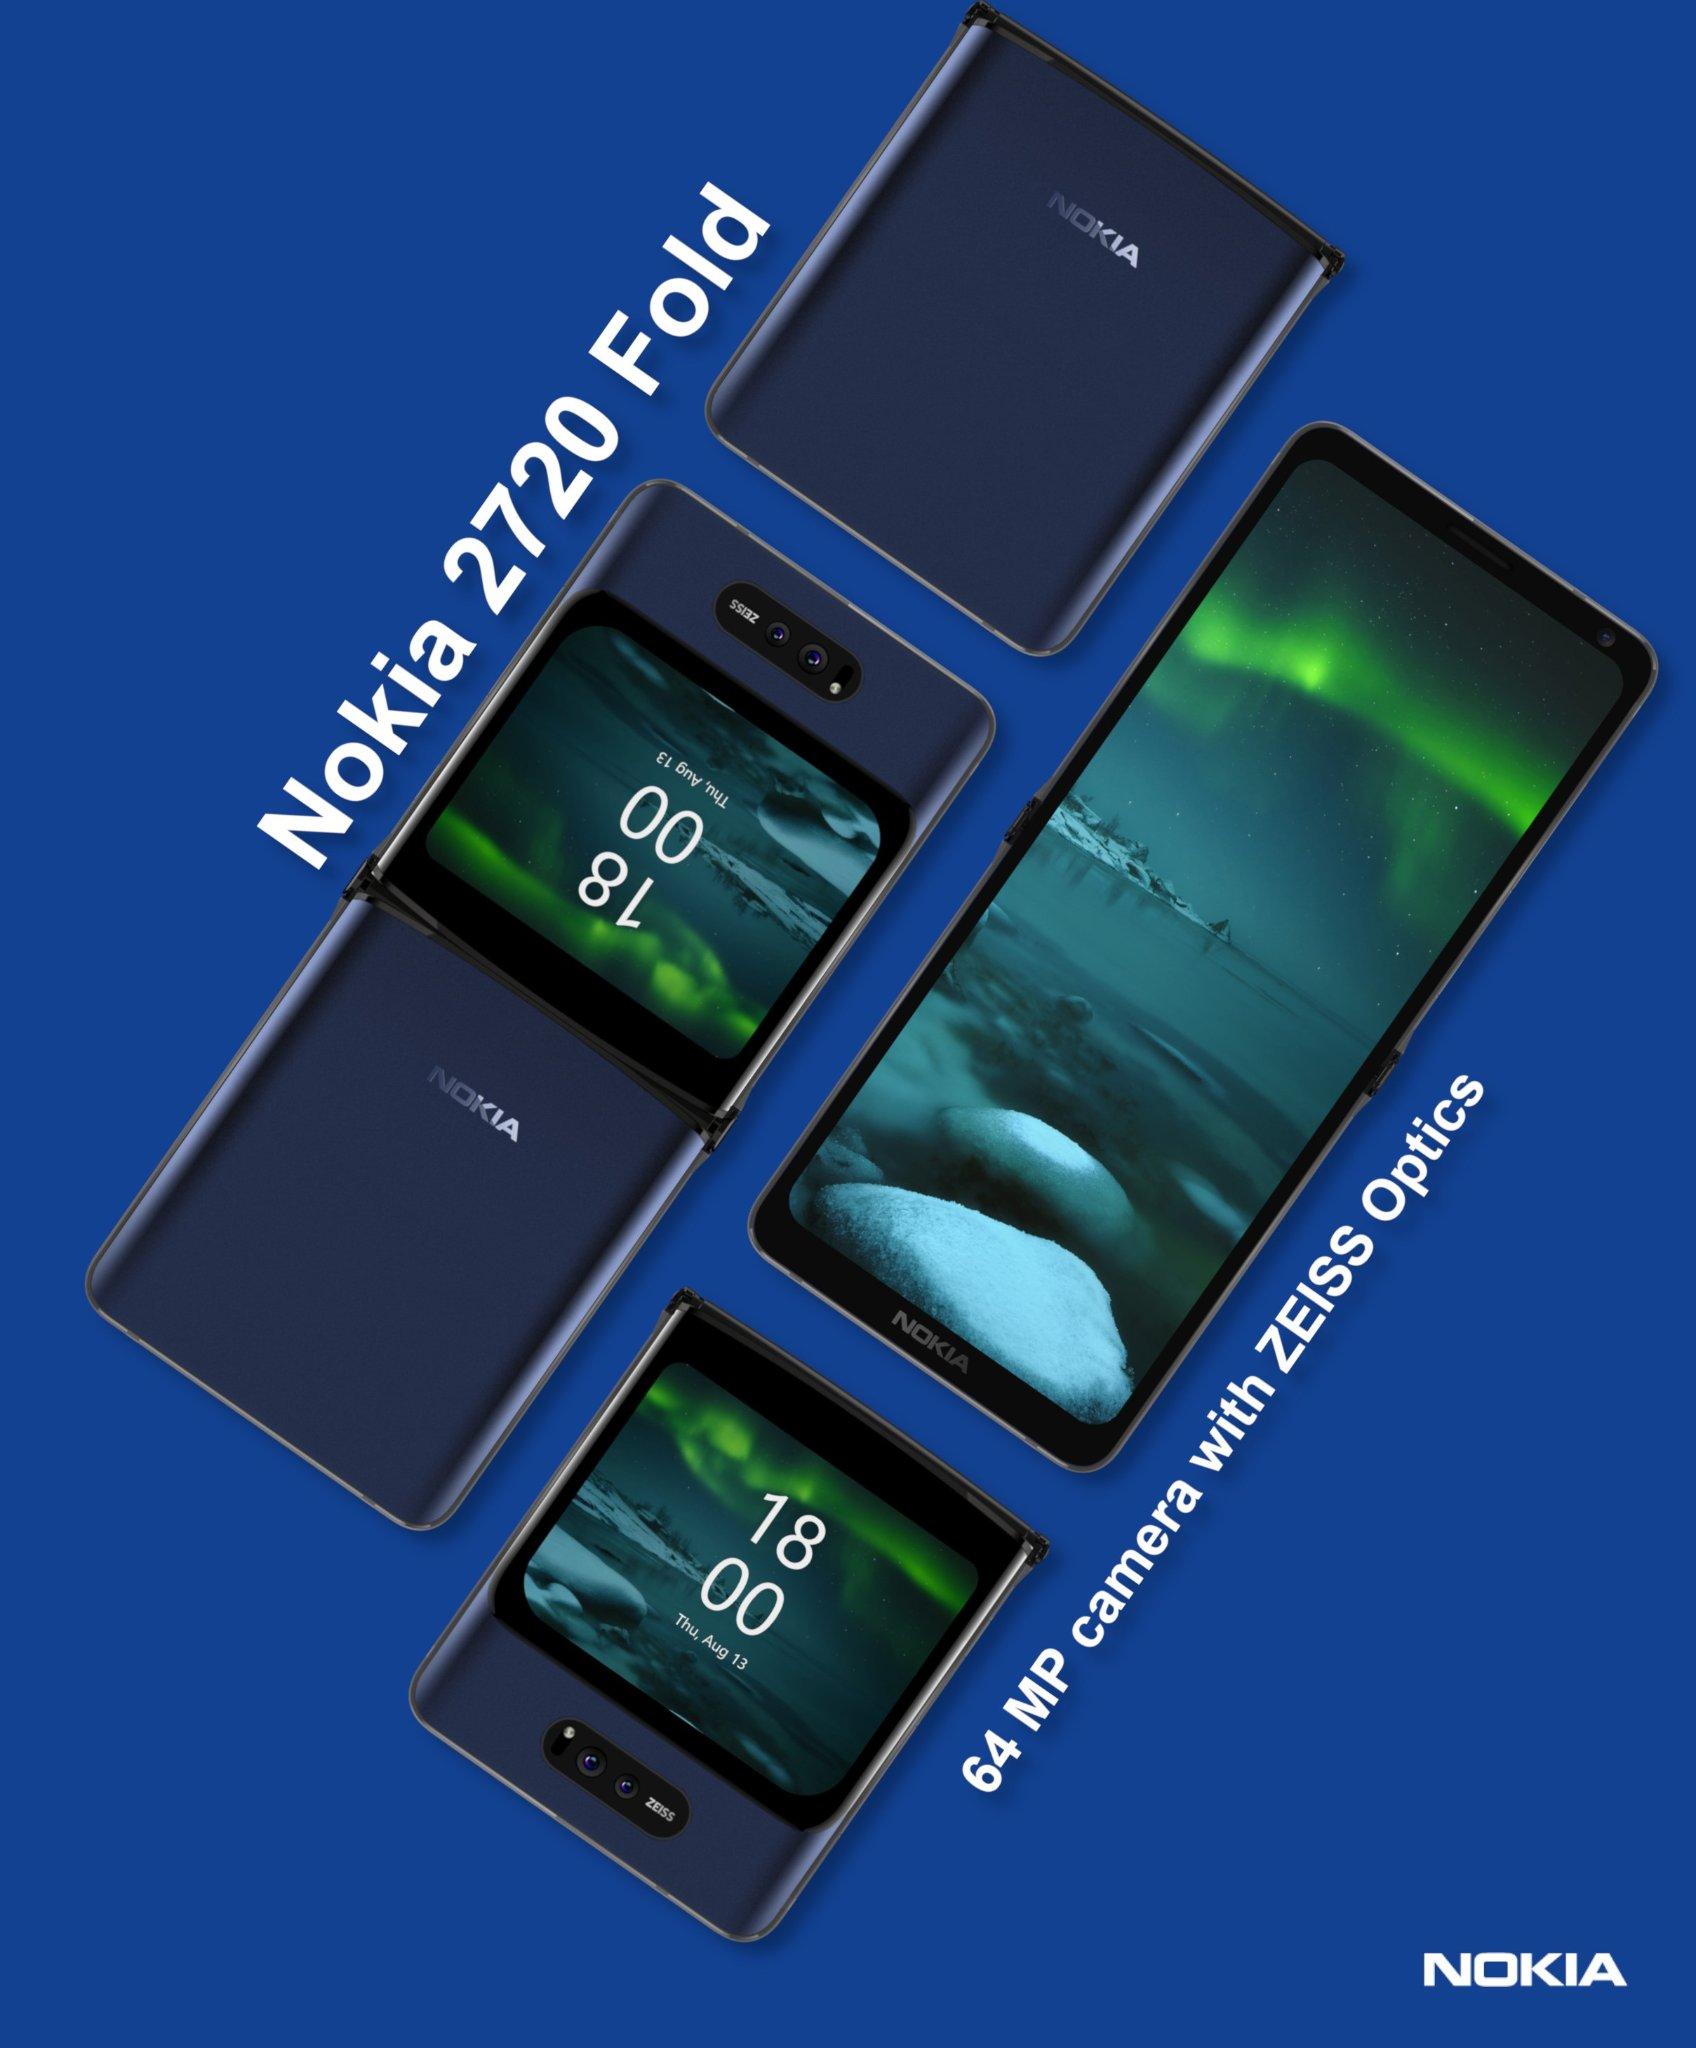 Motives To Recall A Nokia Cell Smartphone